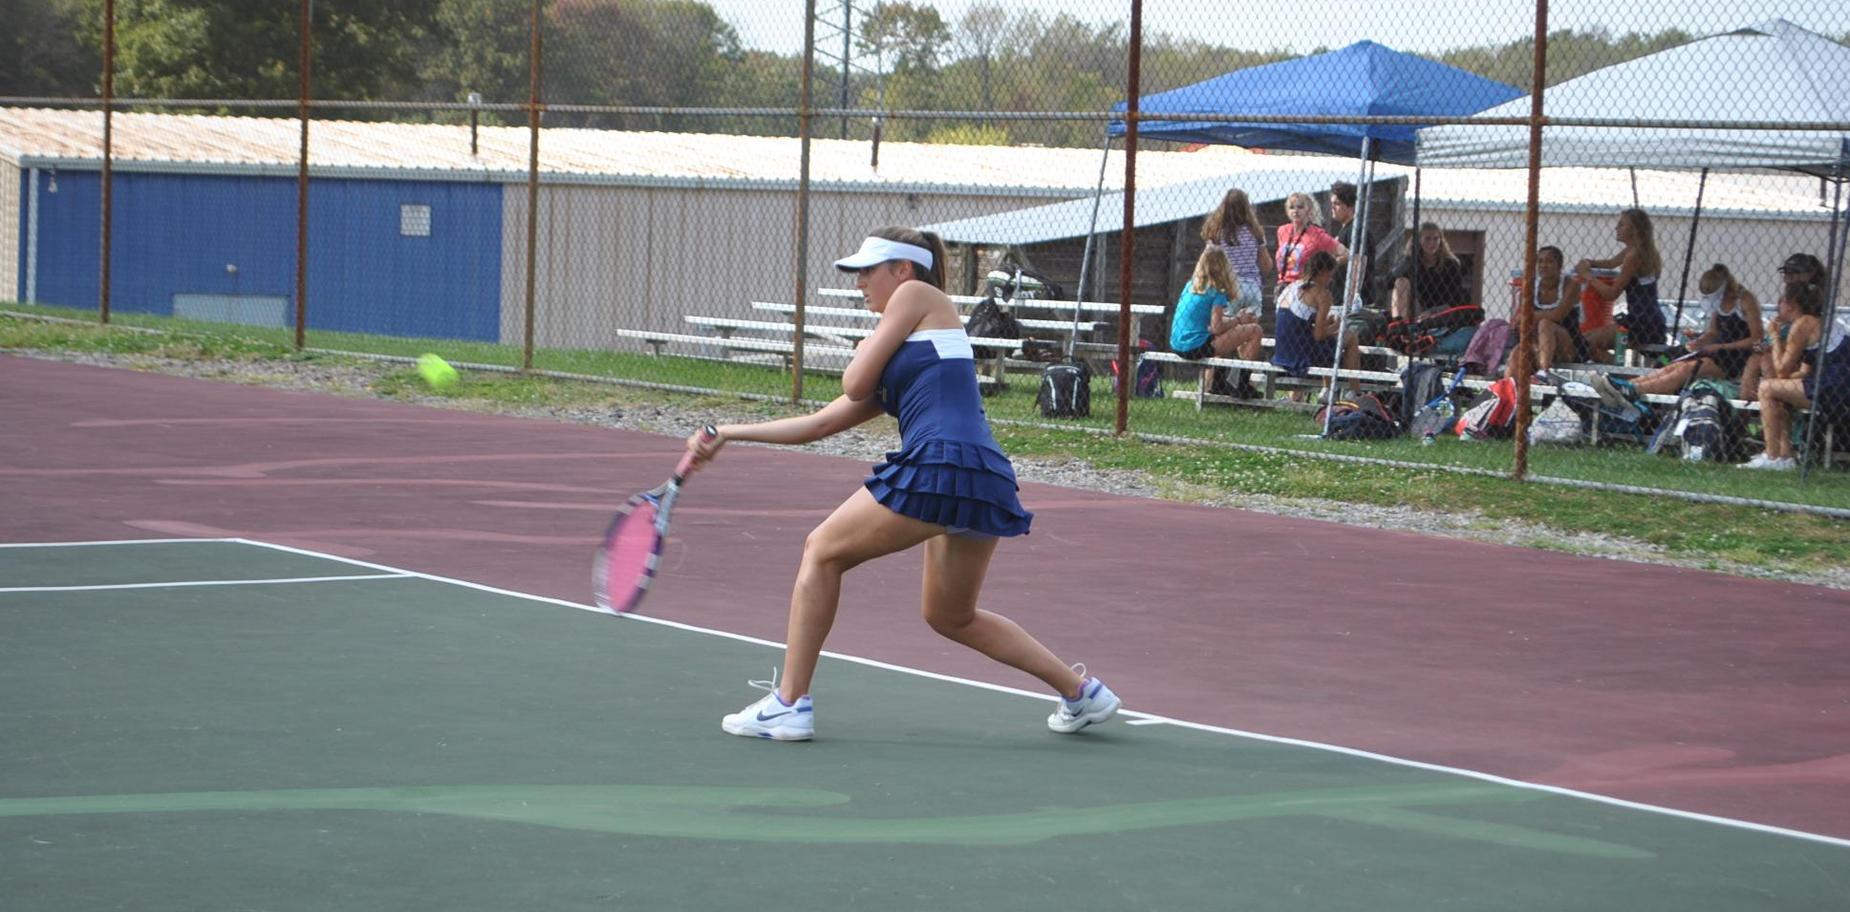 Knoch tennis player